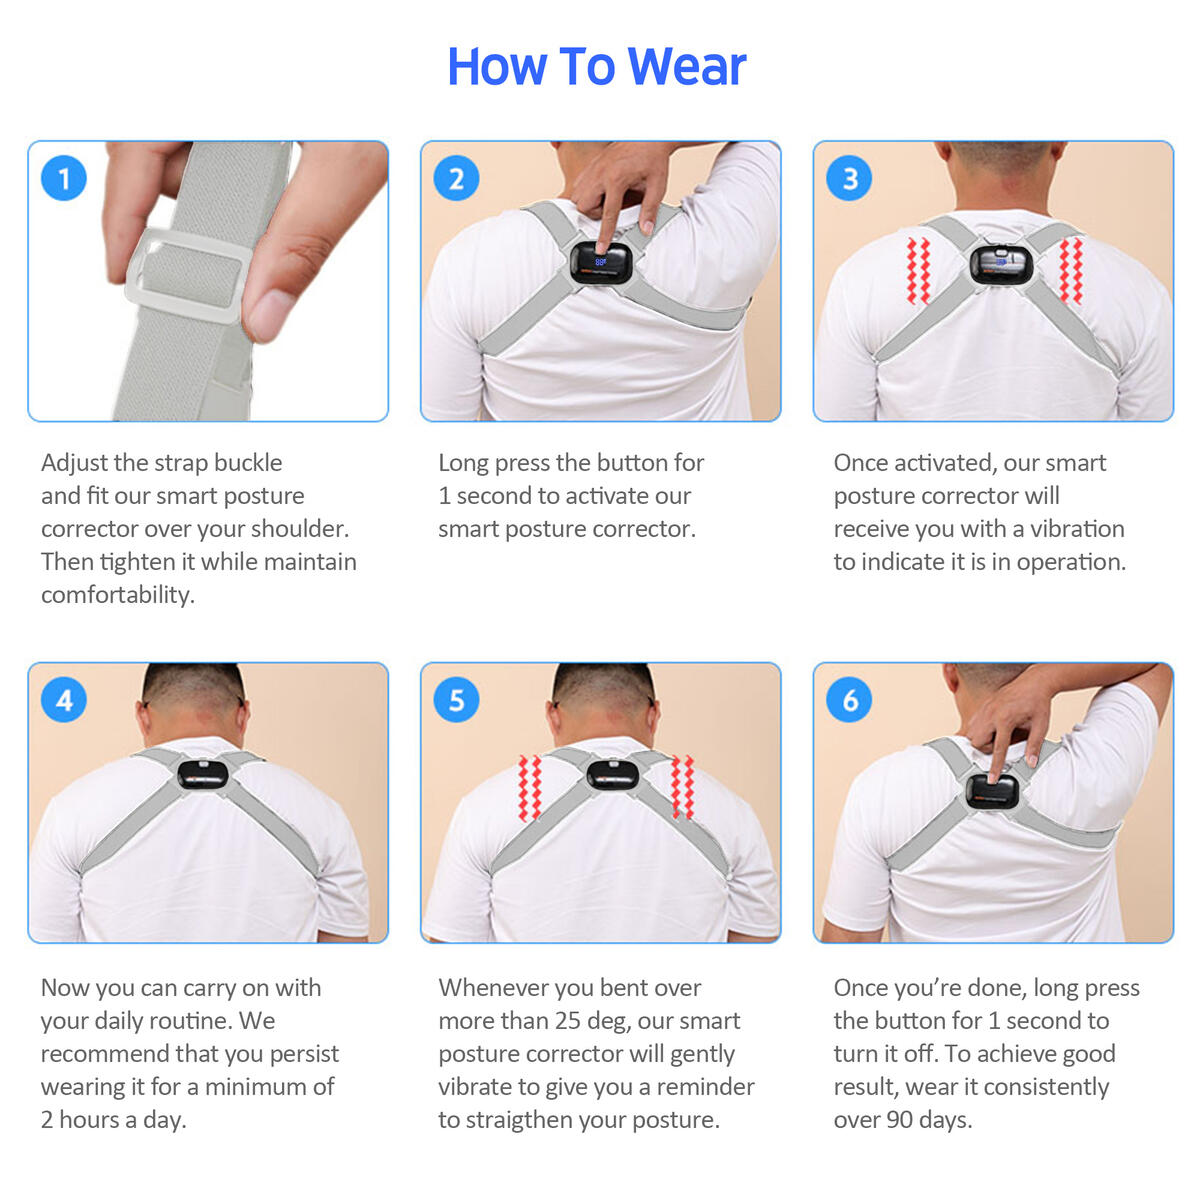 Acbex Smart Posture Corrector for Women, Men & Kids (Gray) - FREE SHIPPING